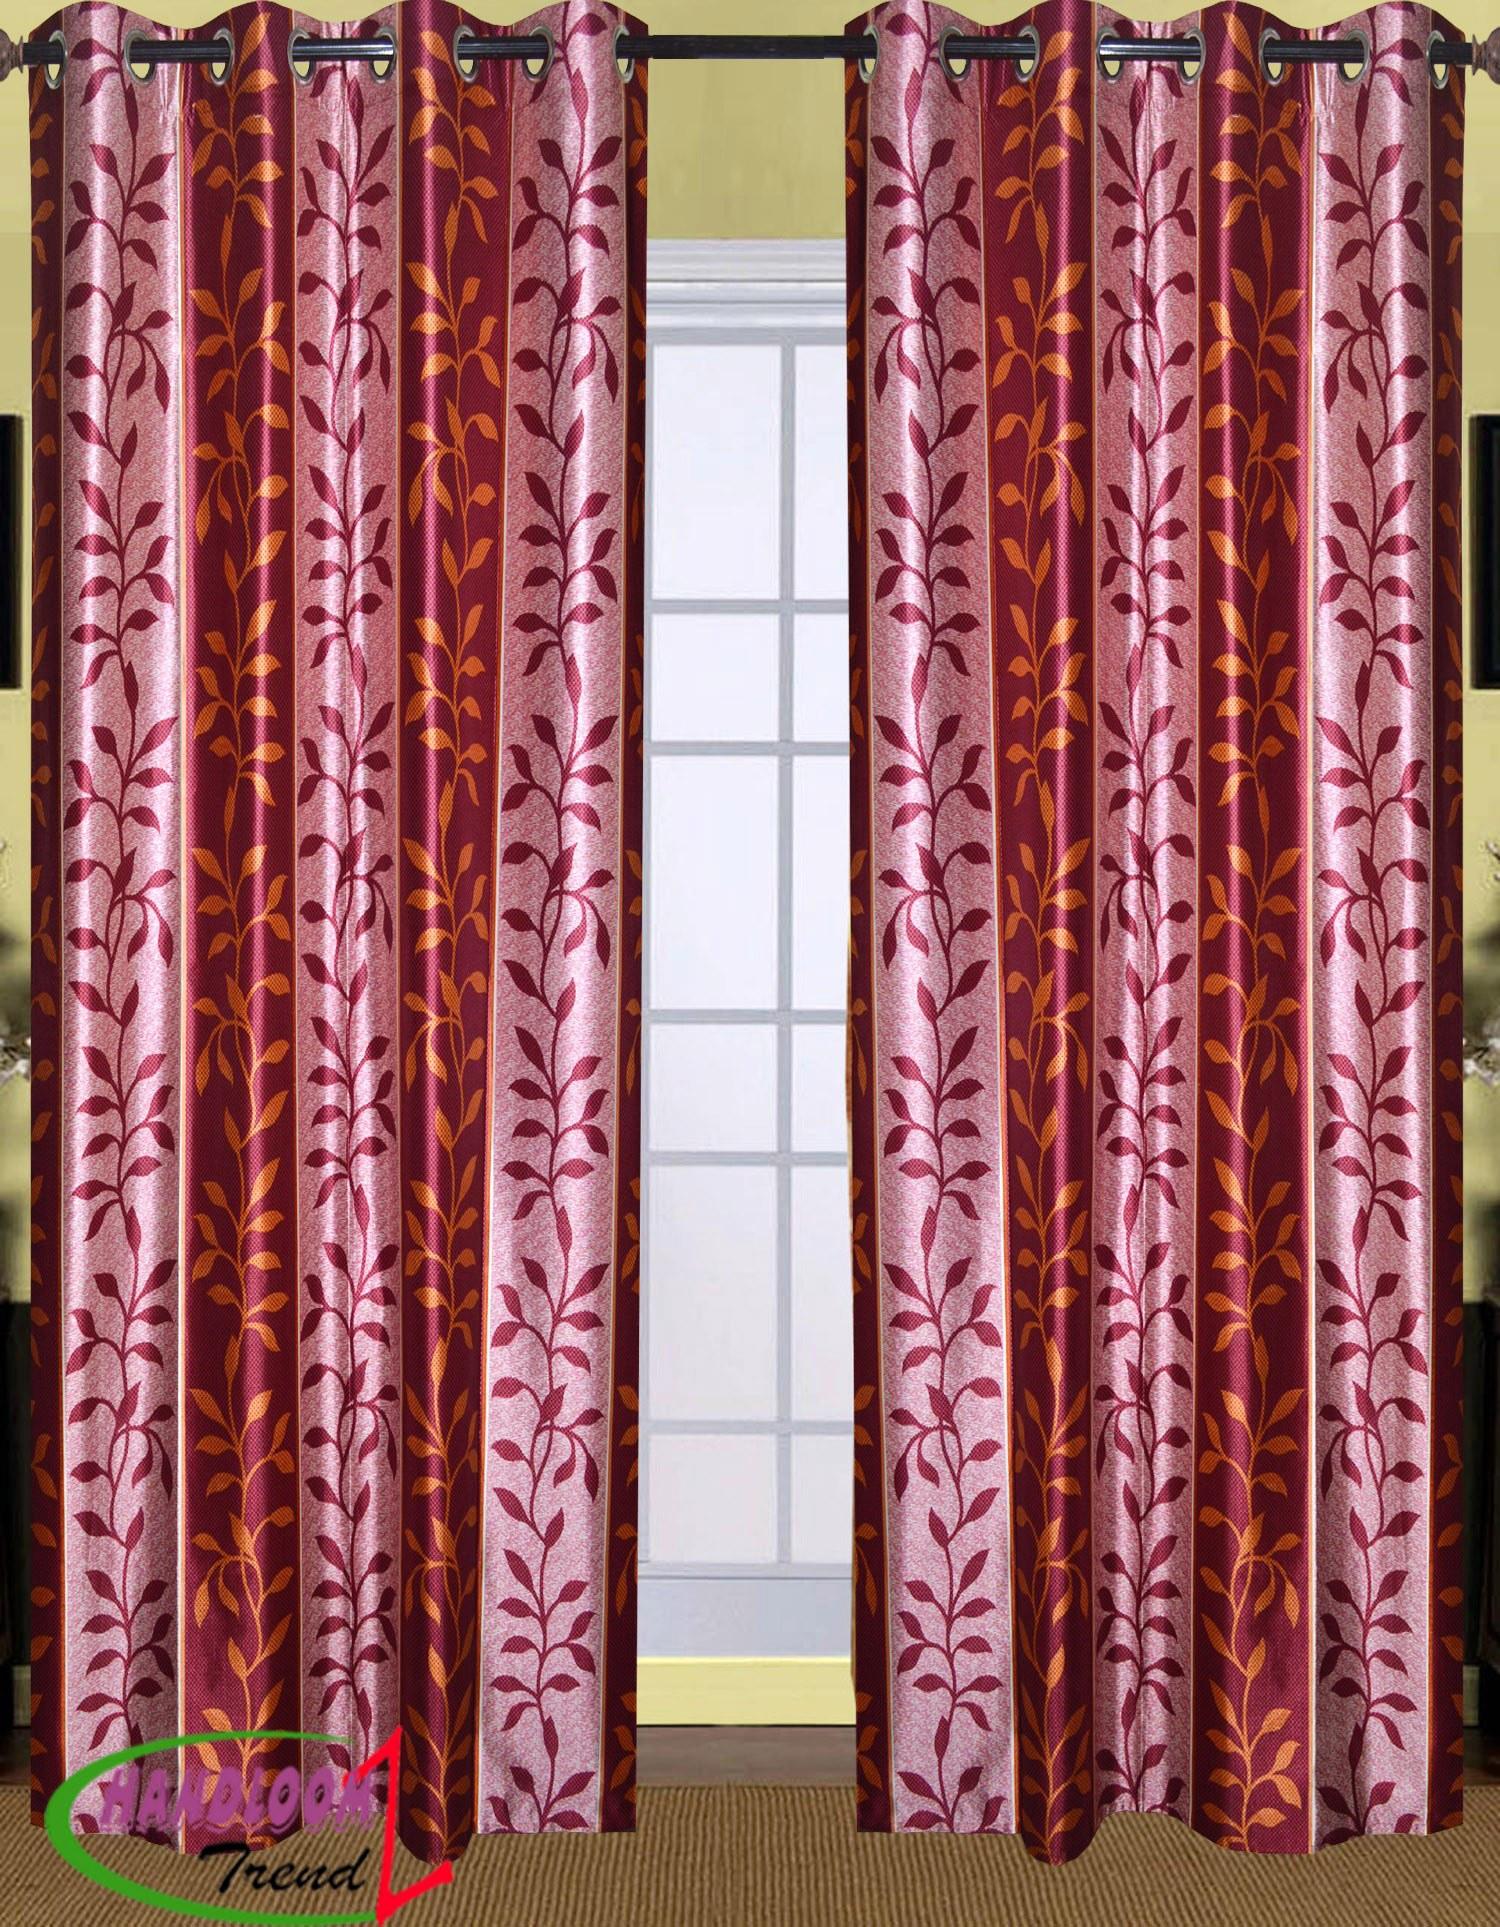 Leaves Design Door Curtain G255DR Home Furnishing HandloomTrendz